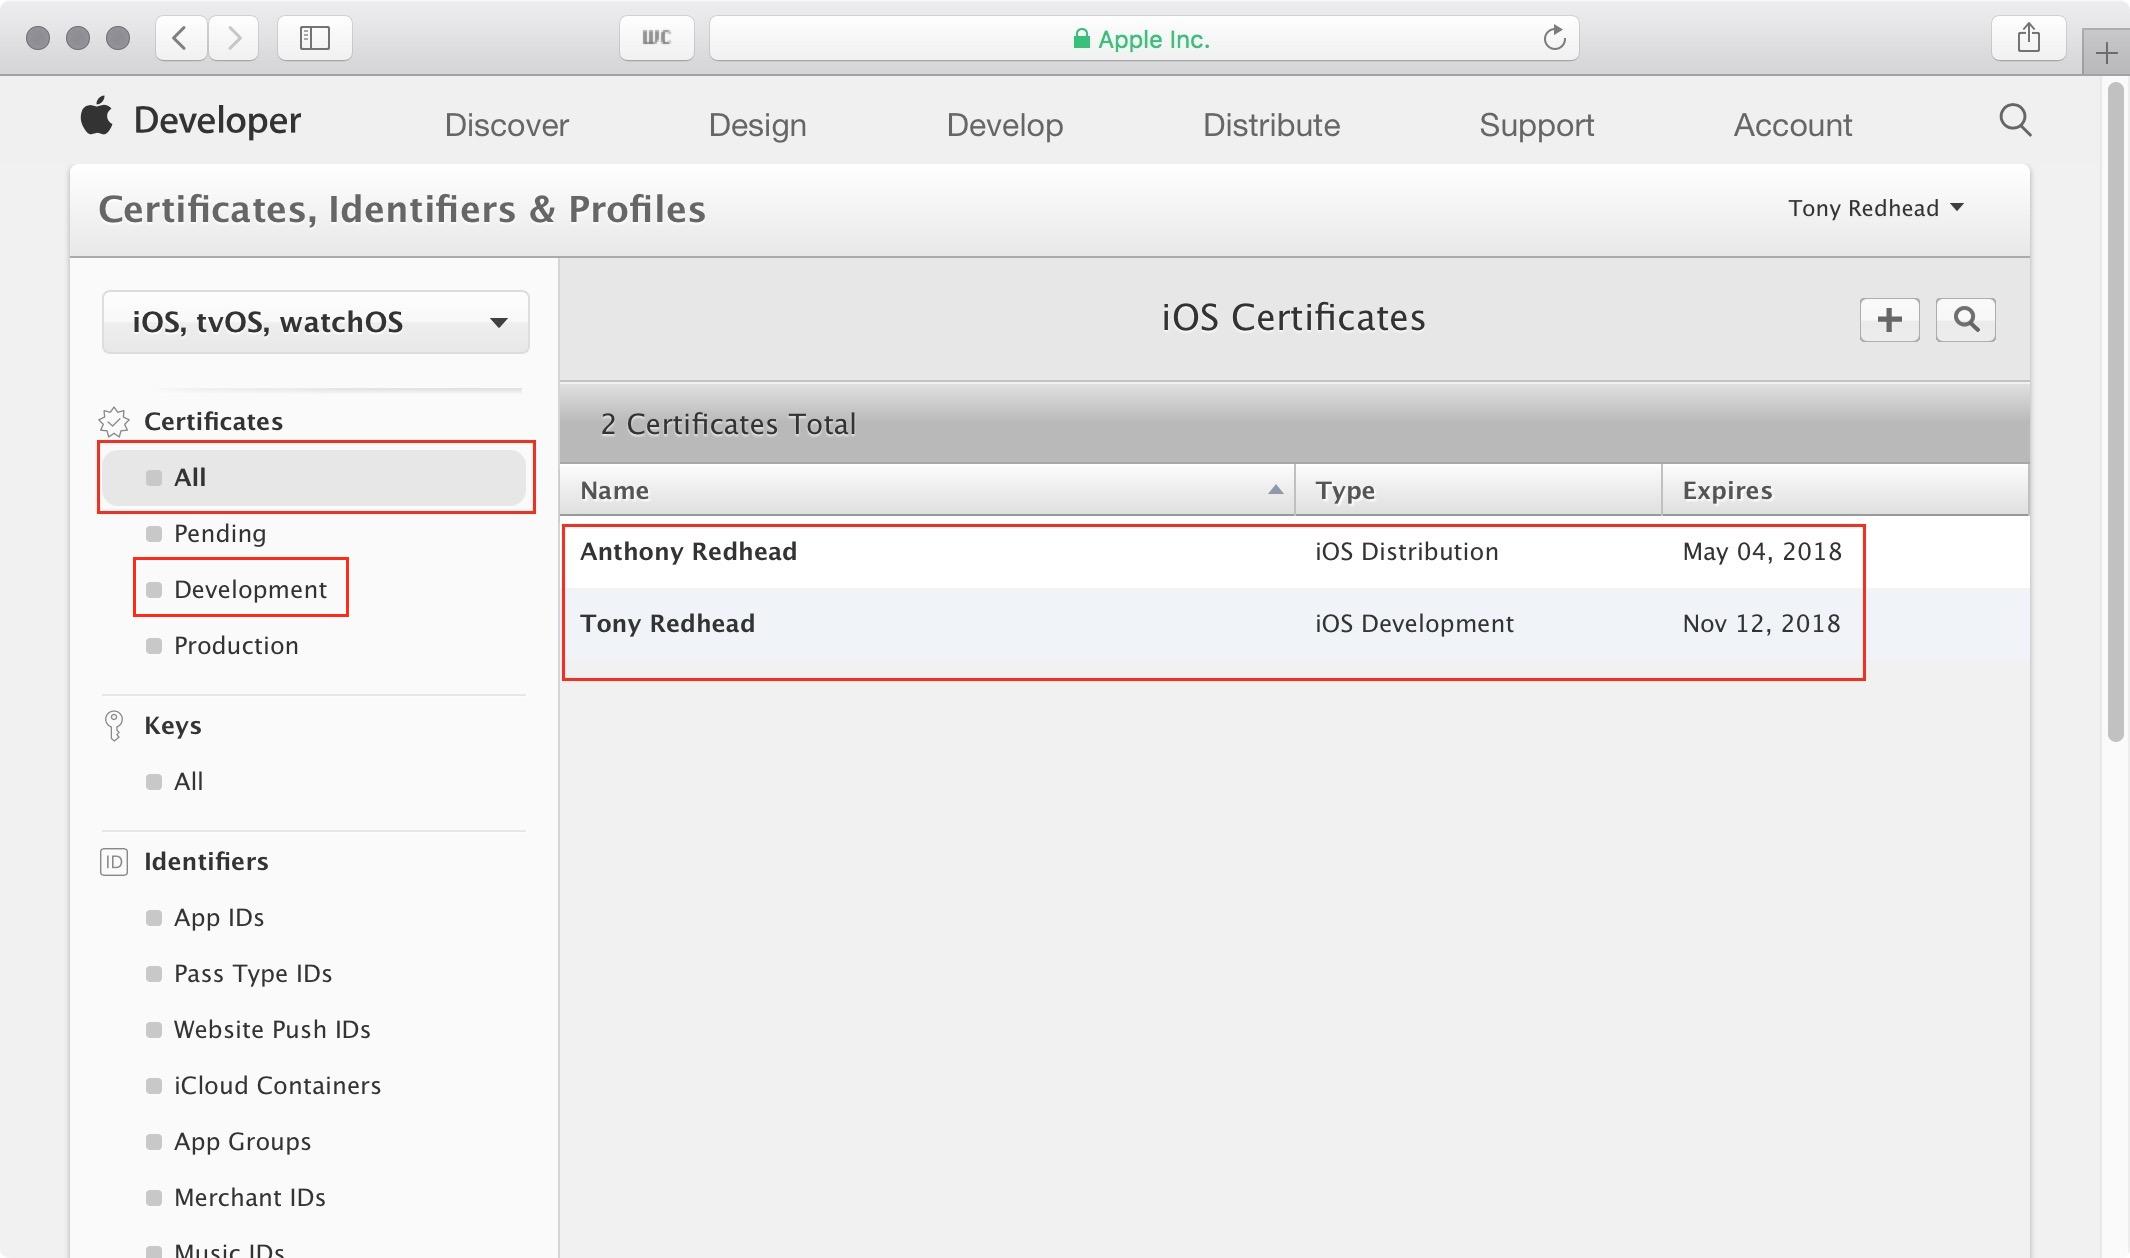 figure #4: iOS Certificates